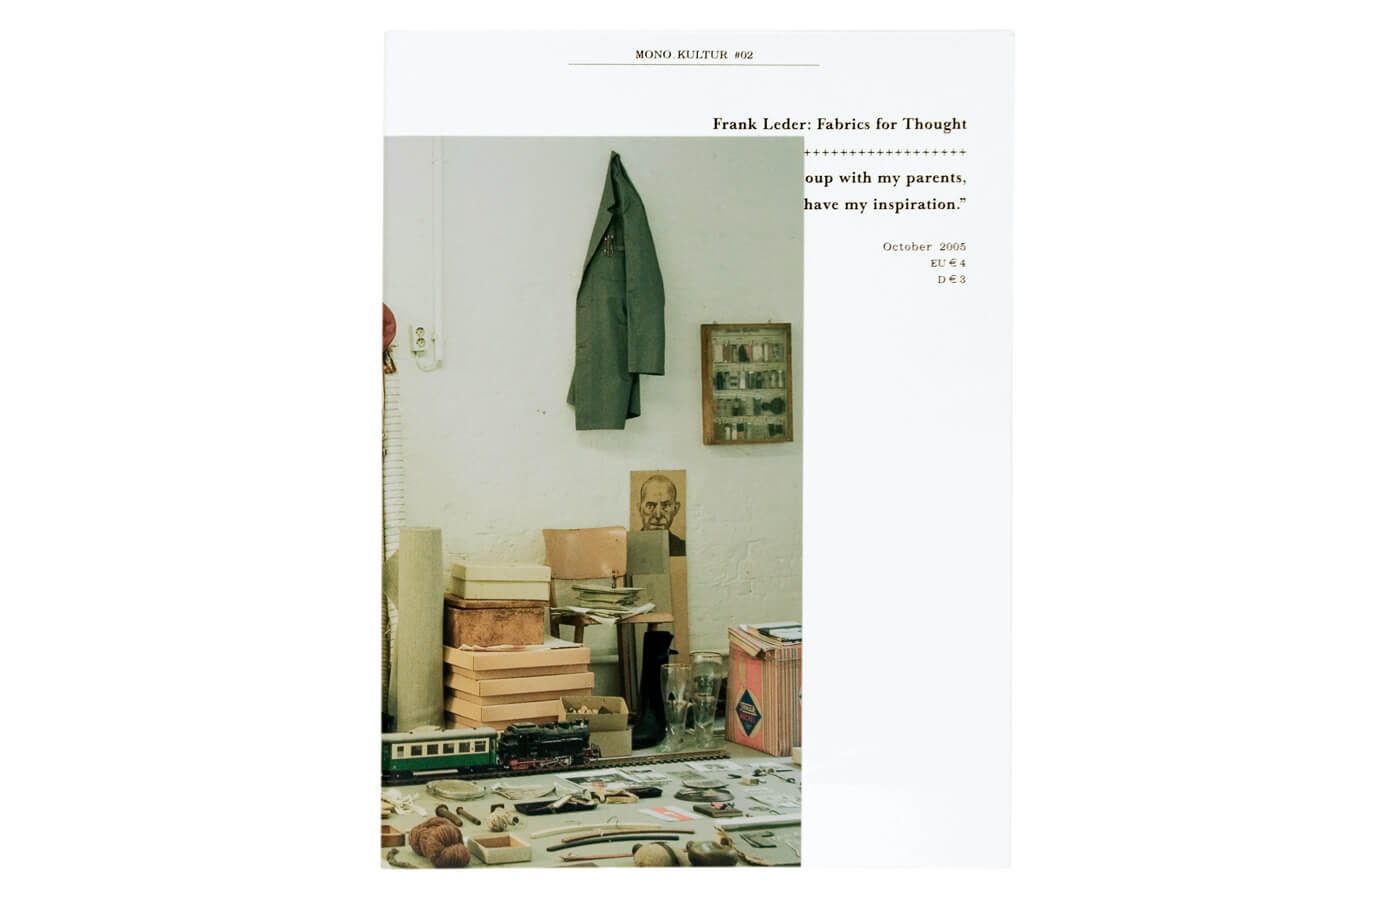 mono.kultur #02, Frank Leder: Fabrics For Thought